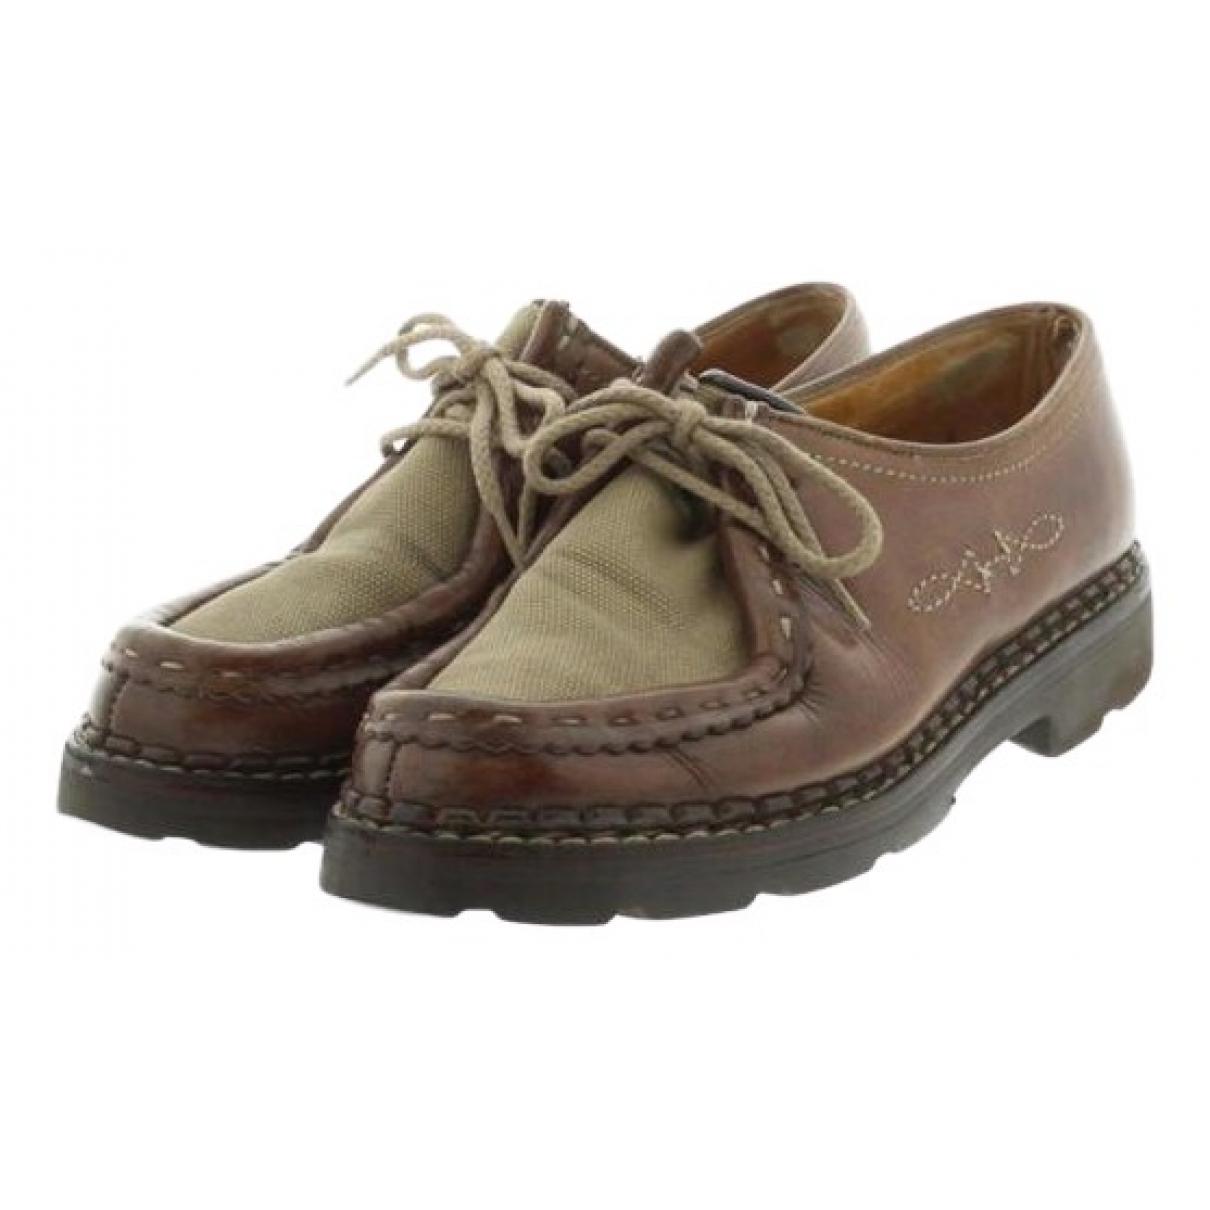 Hermès \N Brown Leather Lace ups for Men 6 US